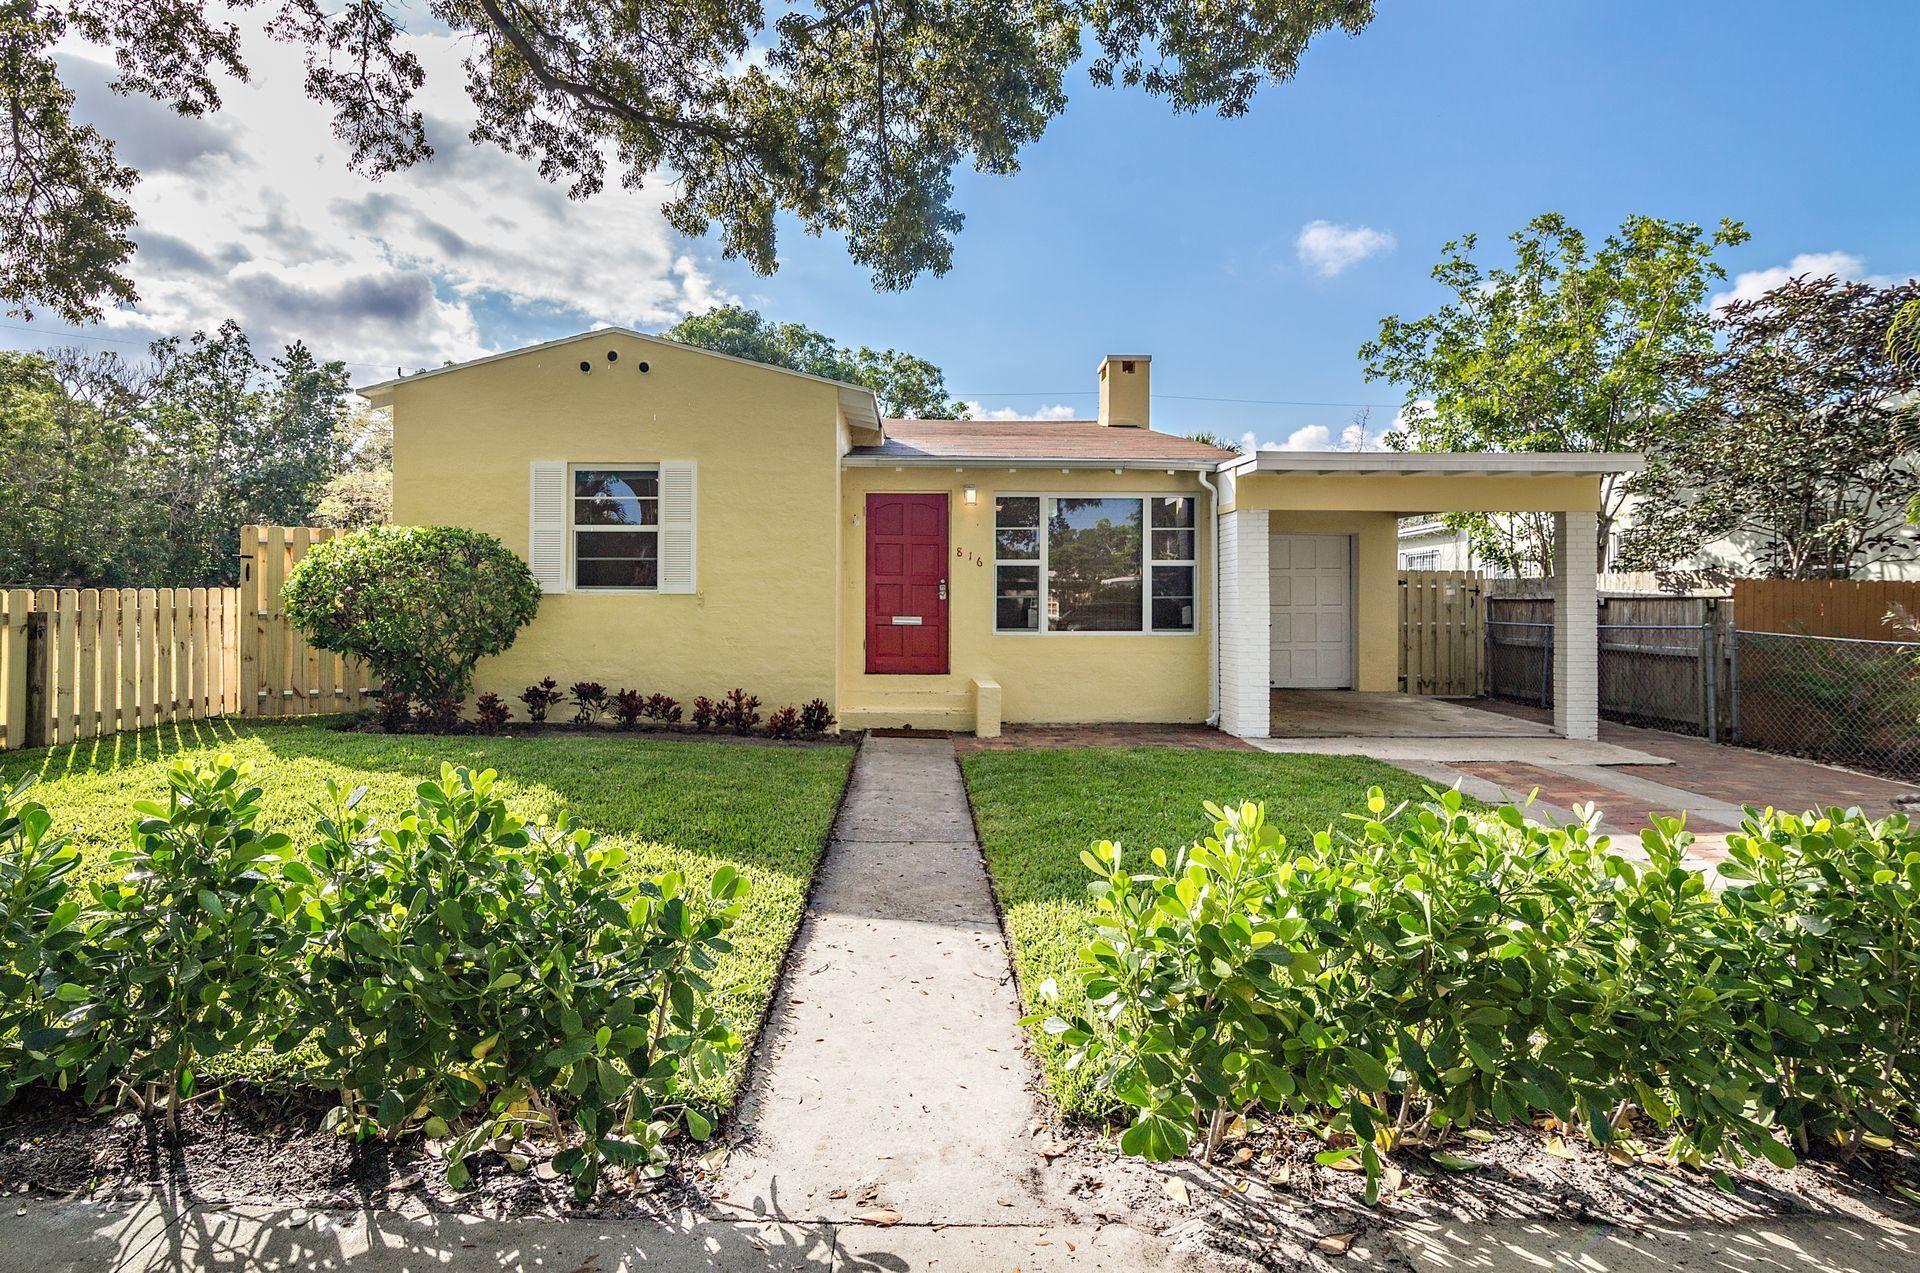 816 Sunset Road, West Palm Beach, FL 33401 - #: RX-10686616